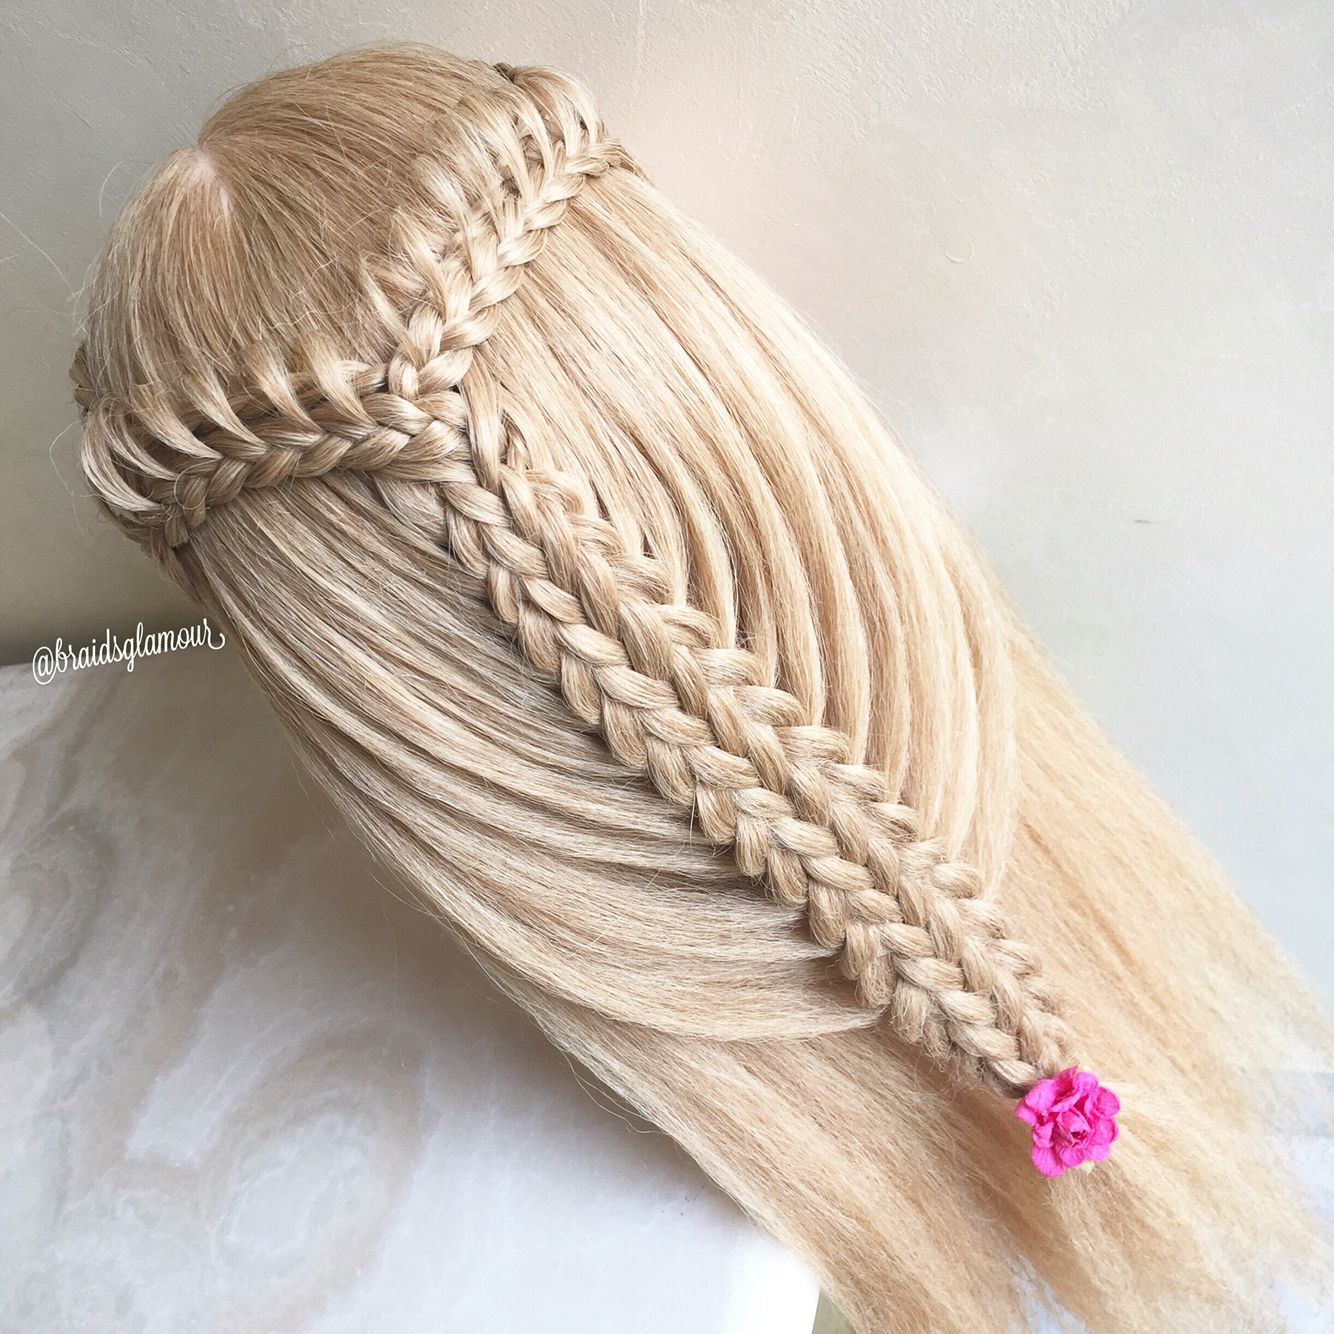 Loop braids into split five strand braid